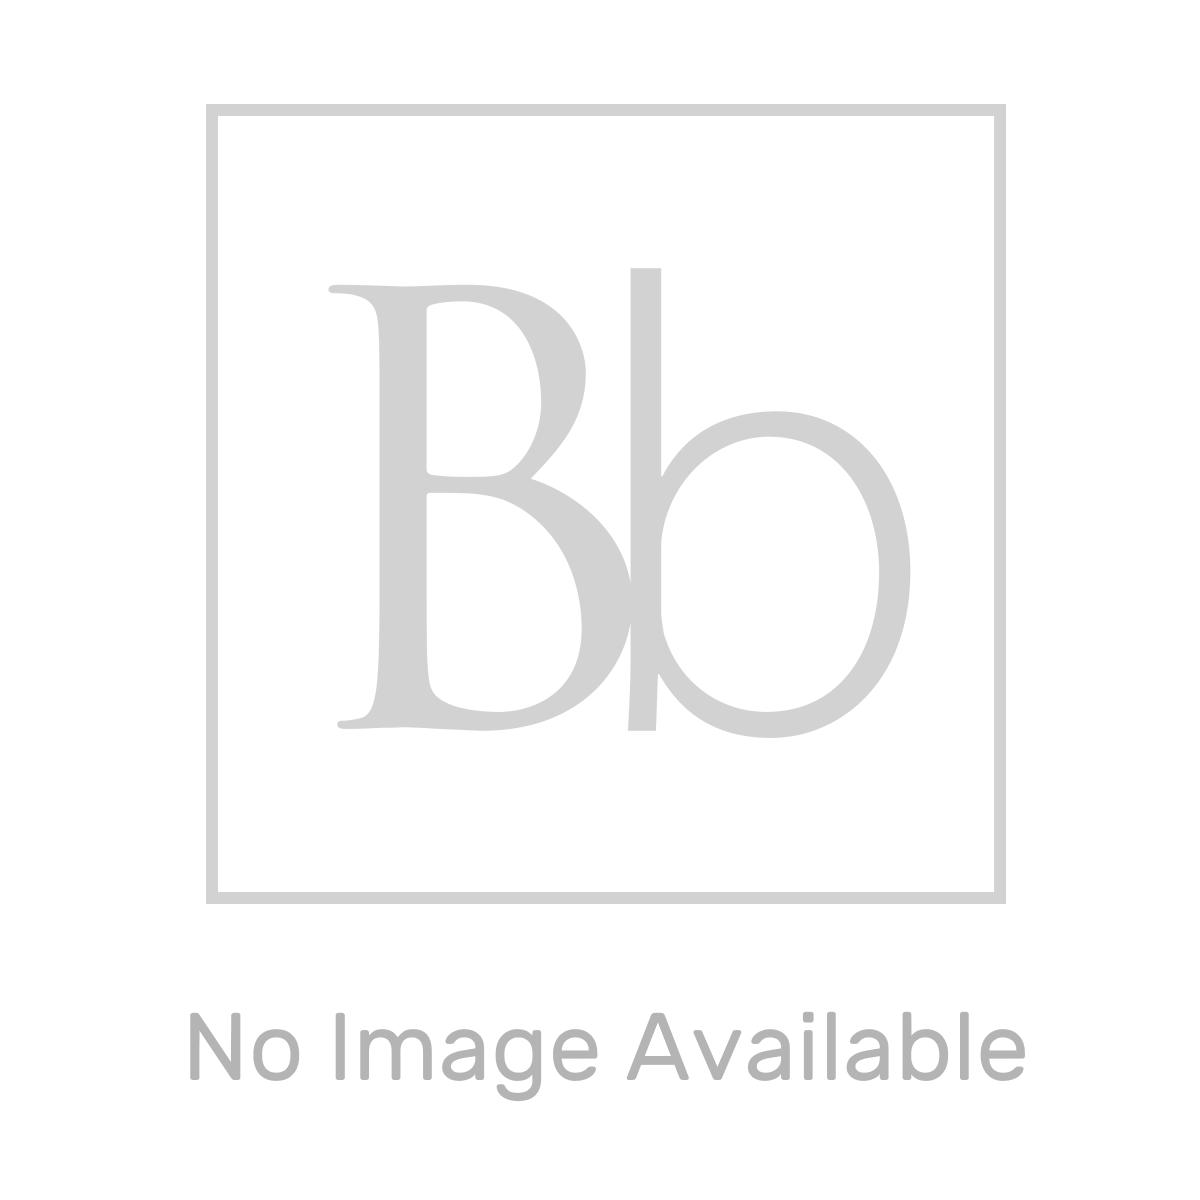 Kartell K-vit White Tetris L Shaped Right Hand Bath with Leg Sets 1500mm